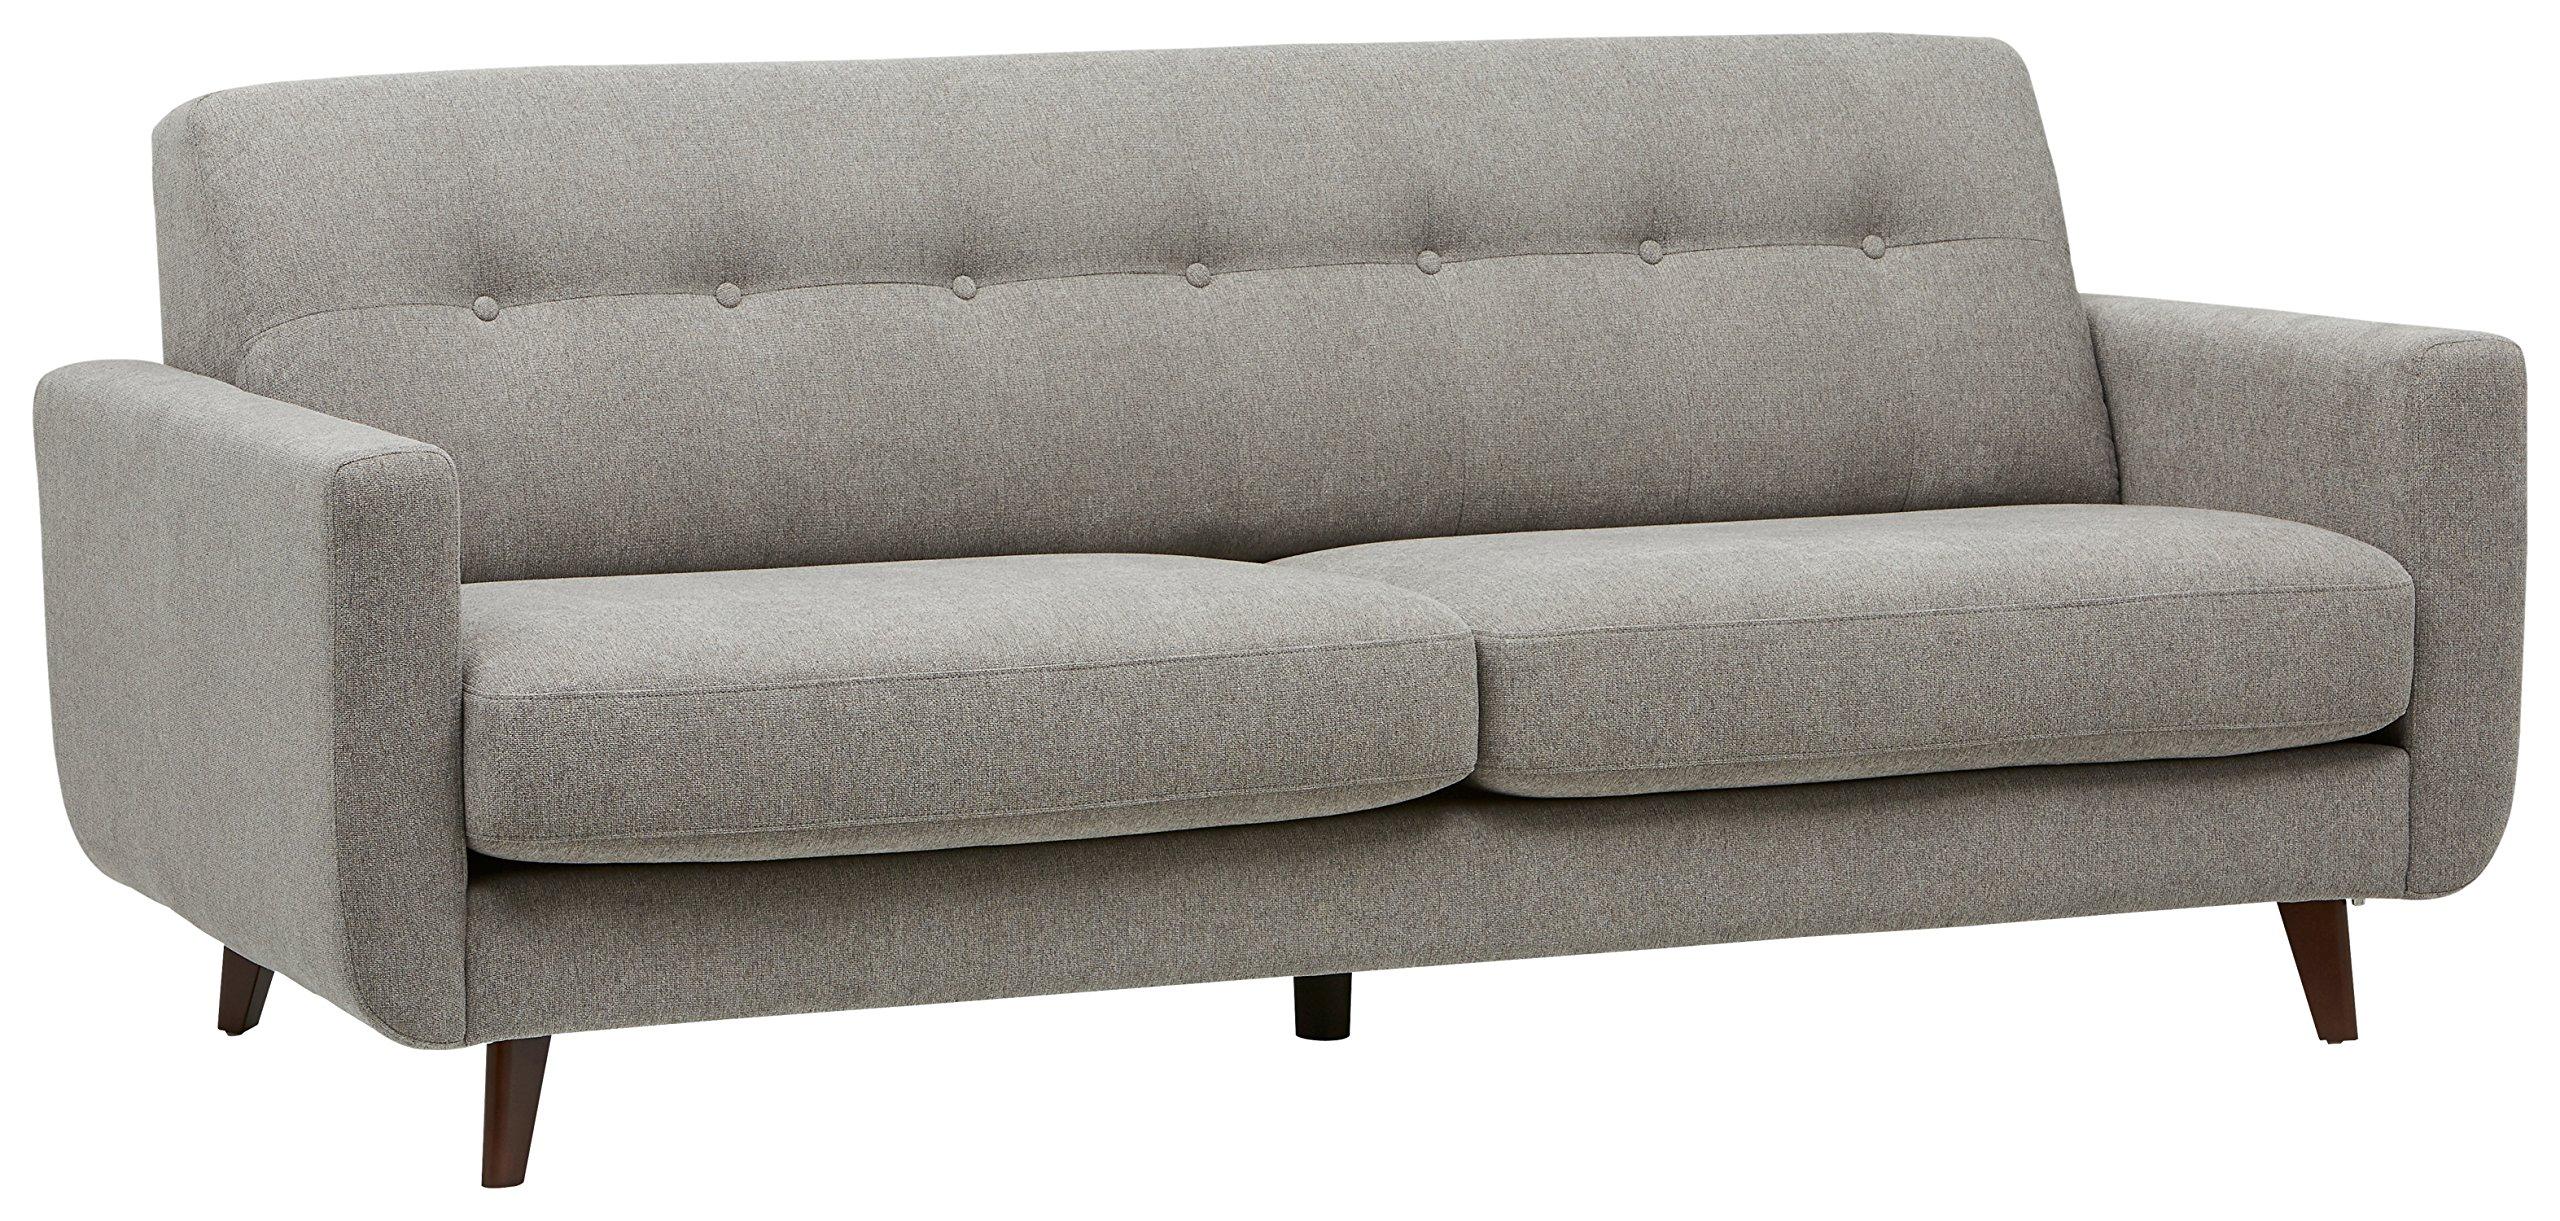 Rivet Sloane Mid-Century Modern Sofa with Tufted Back, 79.9''W, Pebble by Rivet